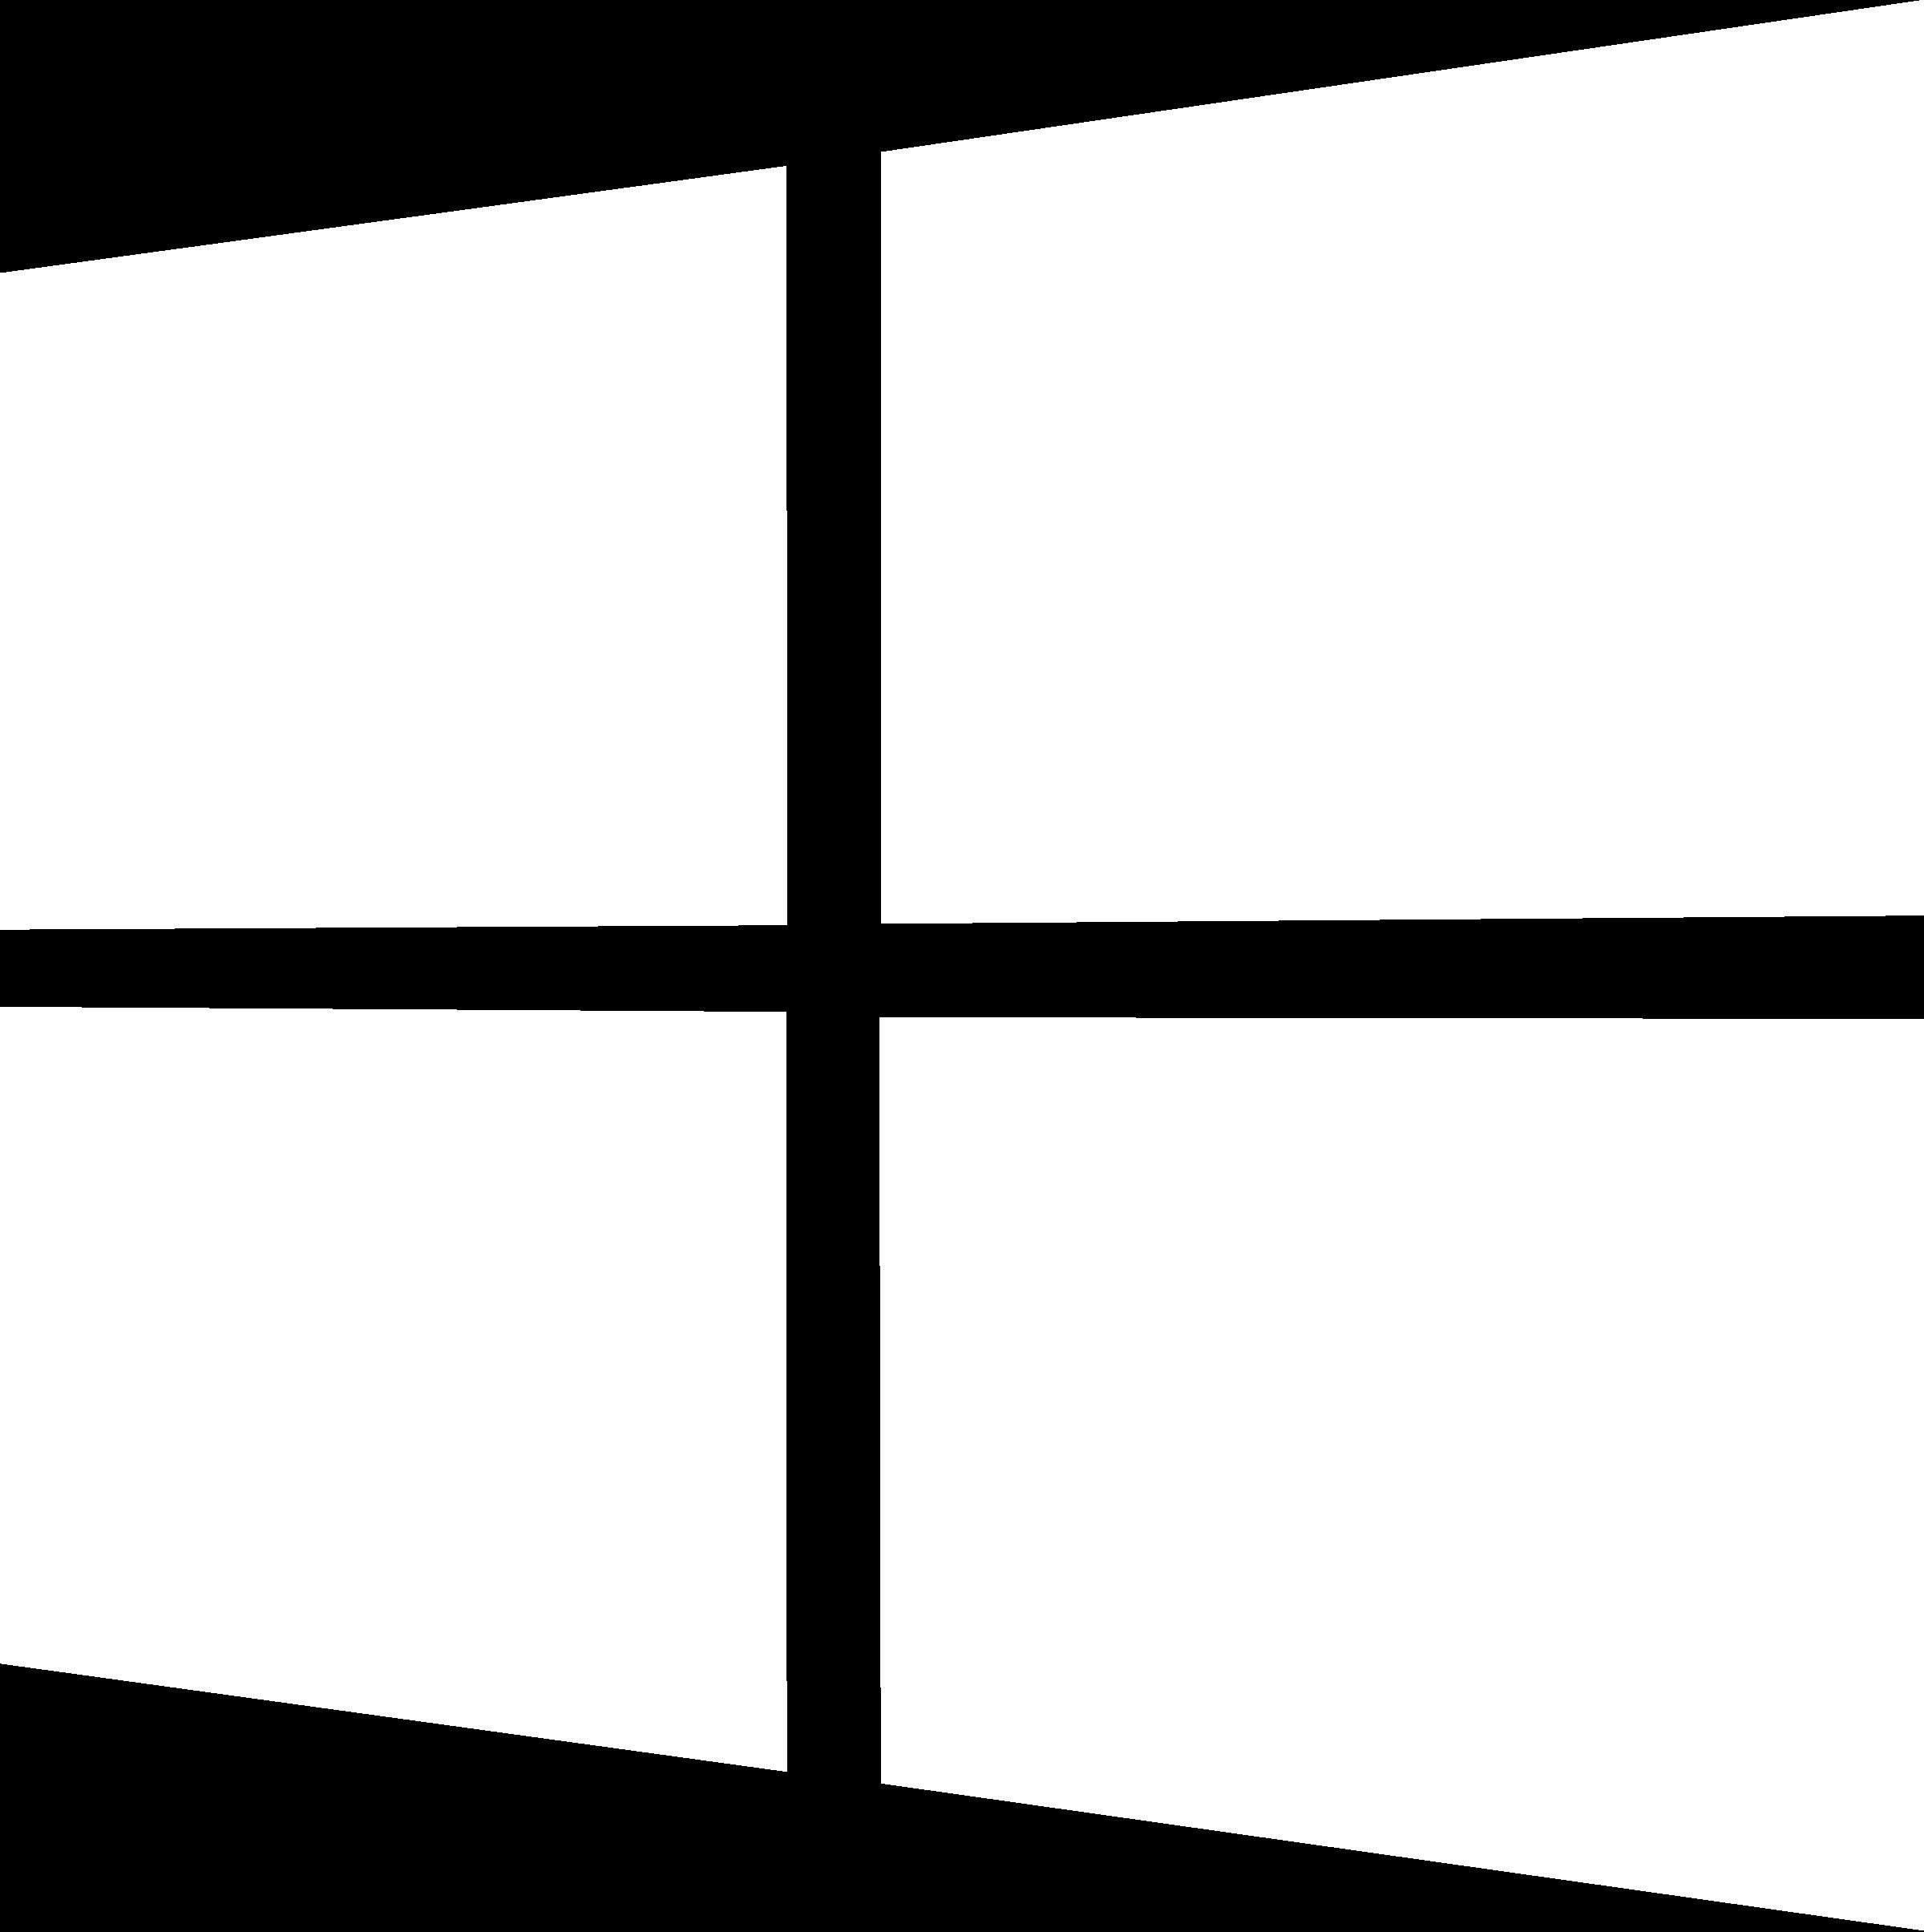 Microsoft transparent svg vector. Windows logo png